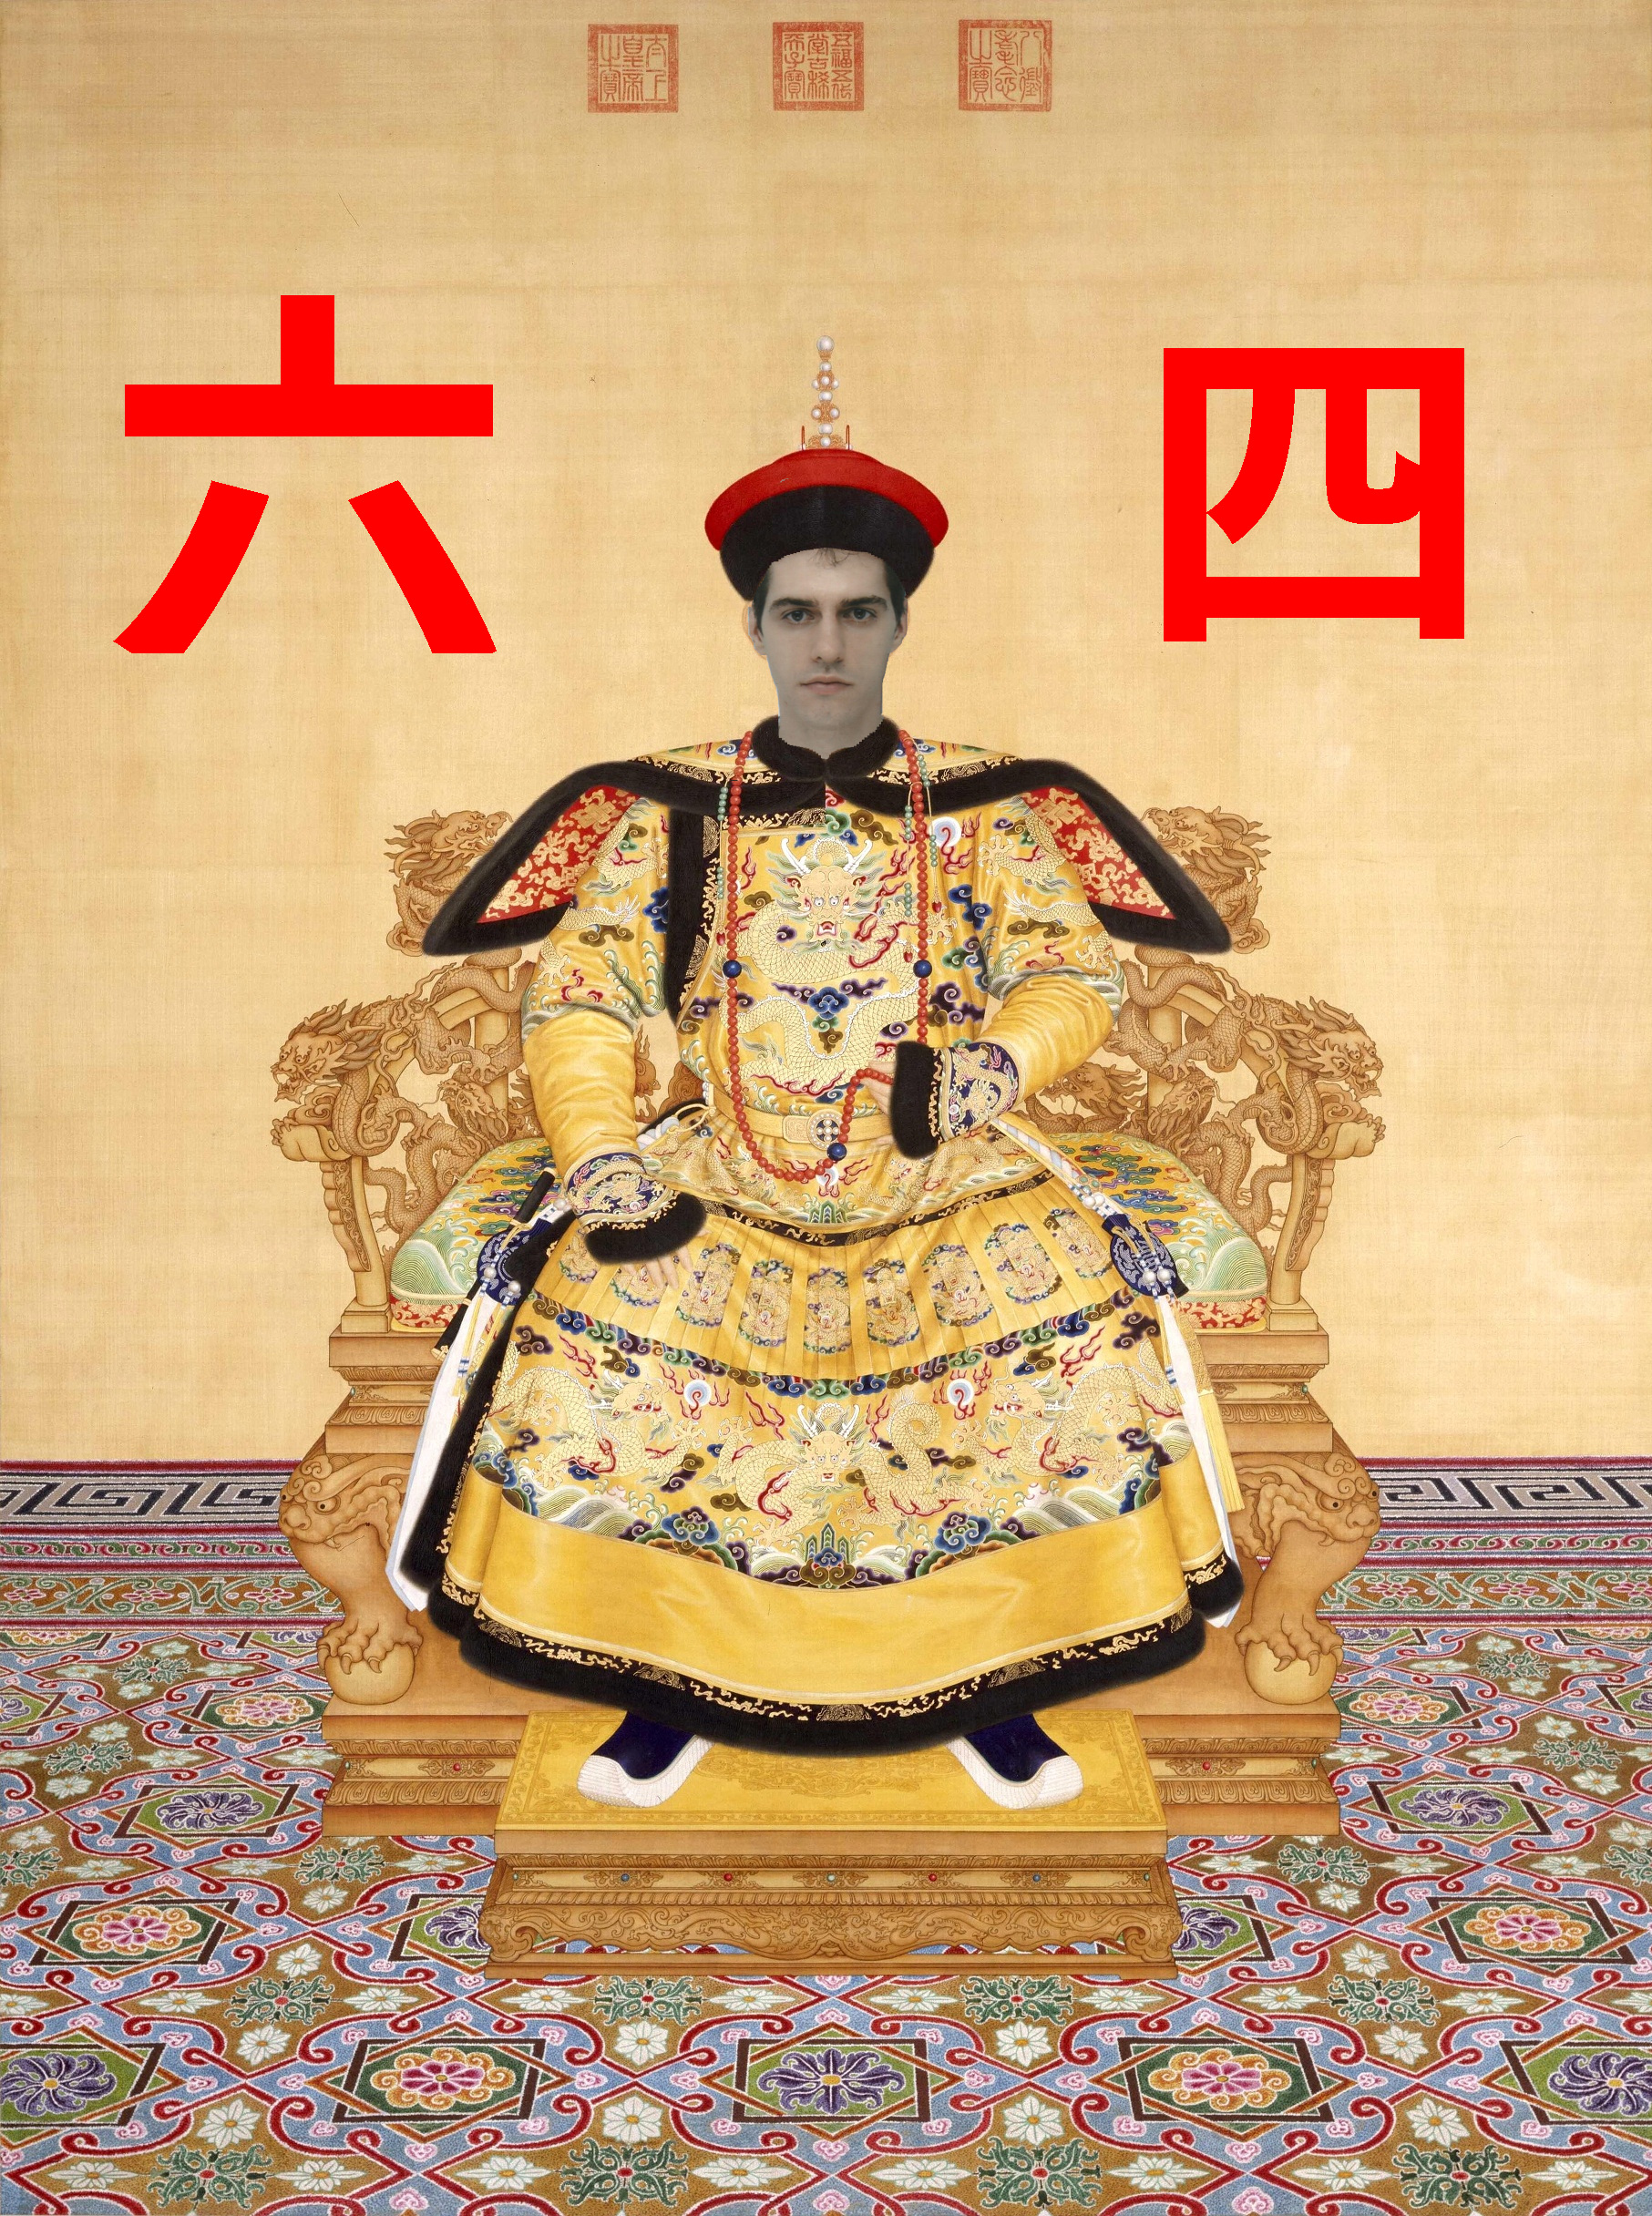 Ciro Santilli portrait as Qing emperor